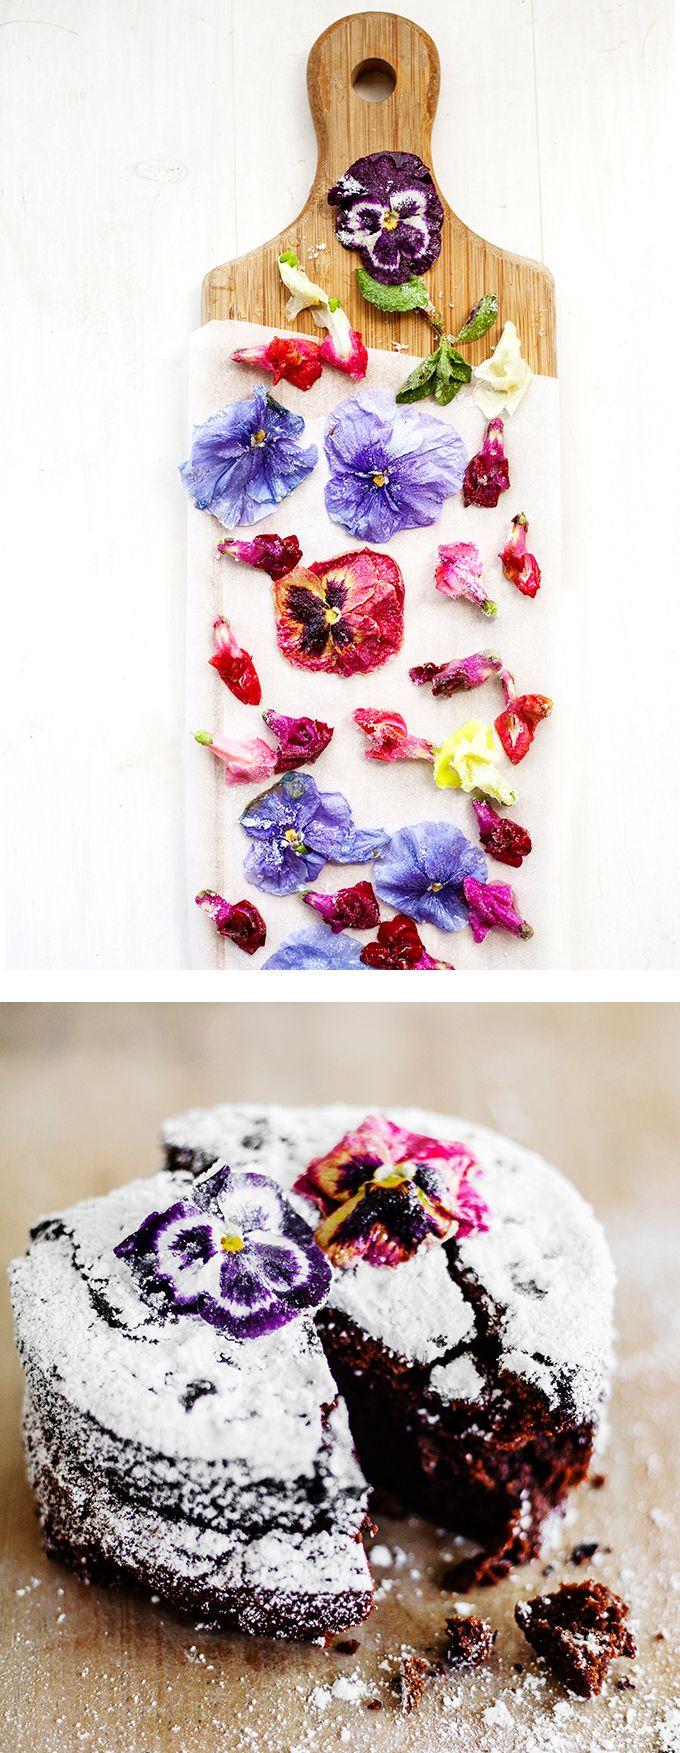 beautiful edible #flowers on a #cake <3